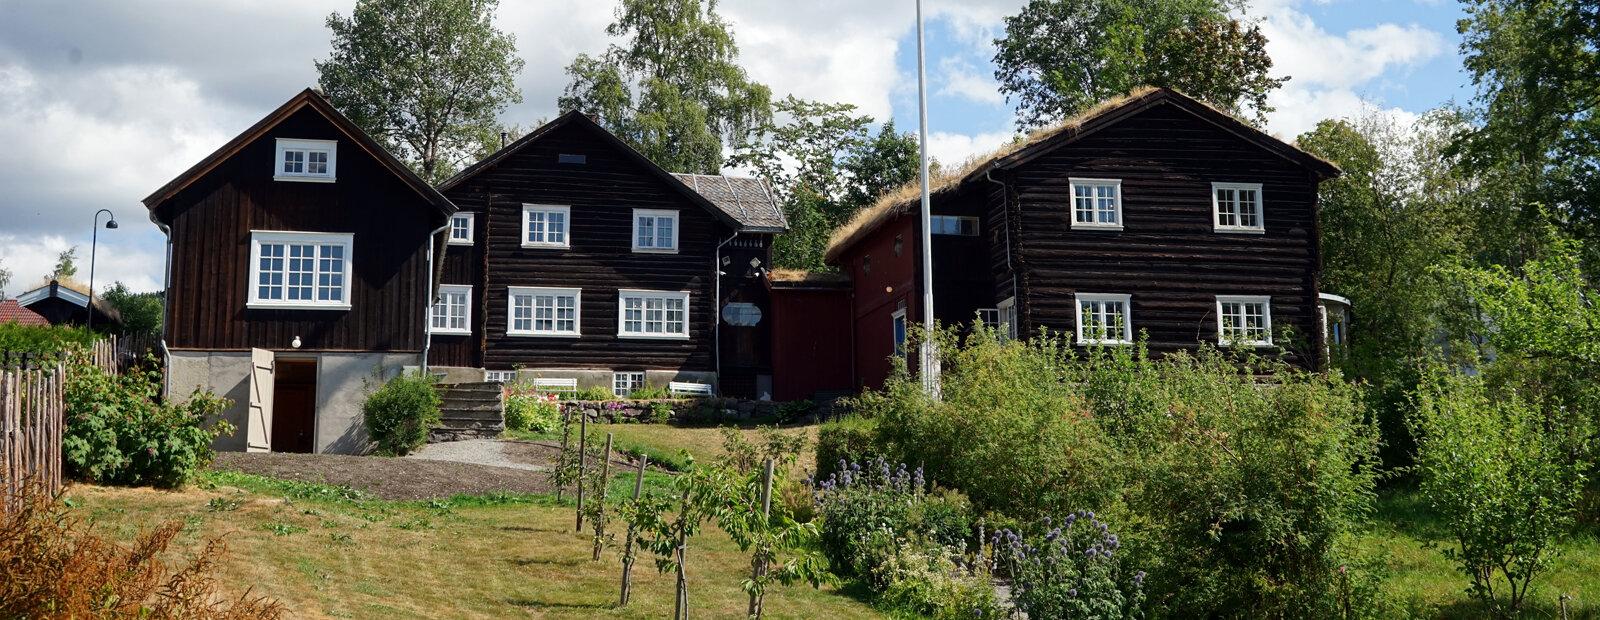 Sigrid Undset's home Bjerkebæk in Lillehammer.